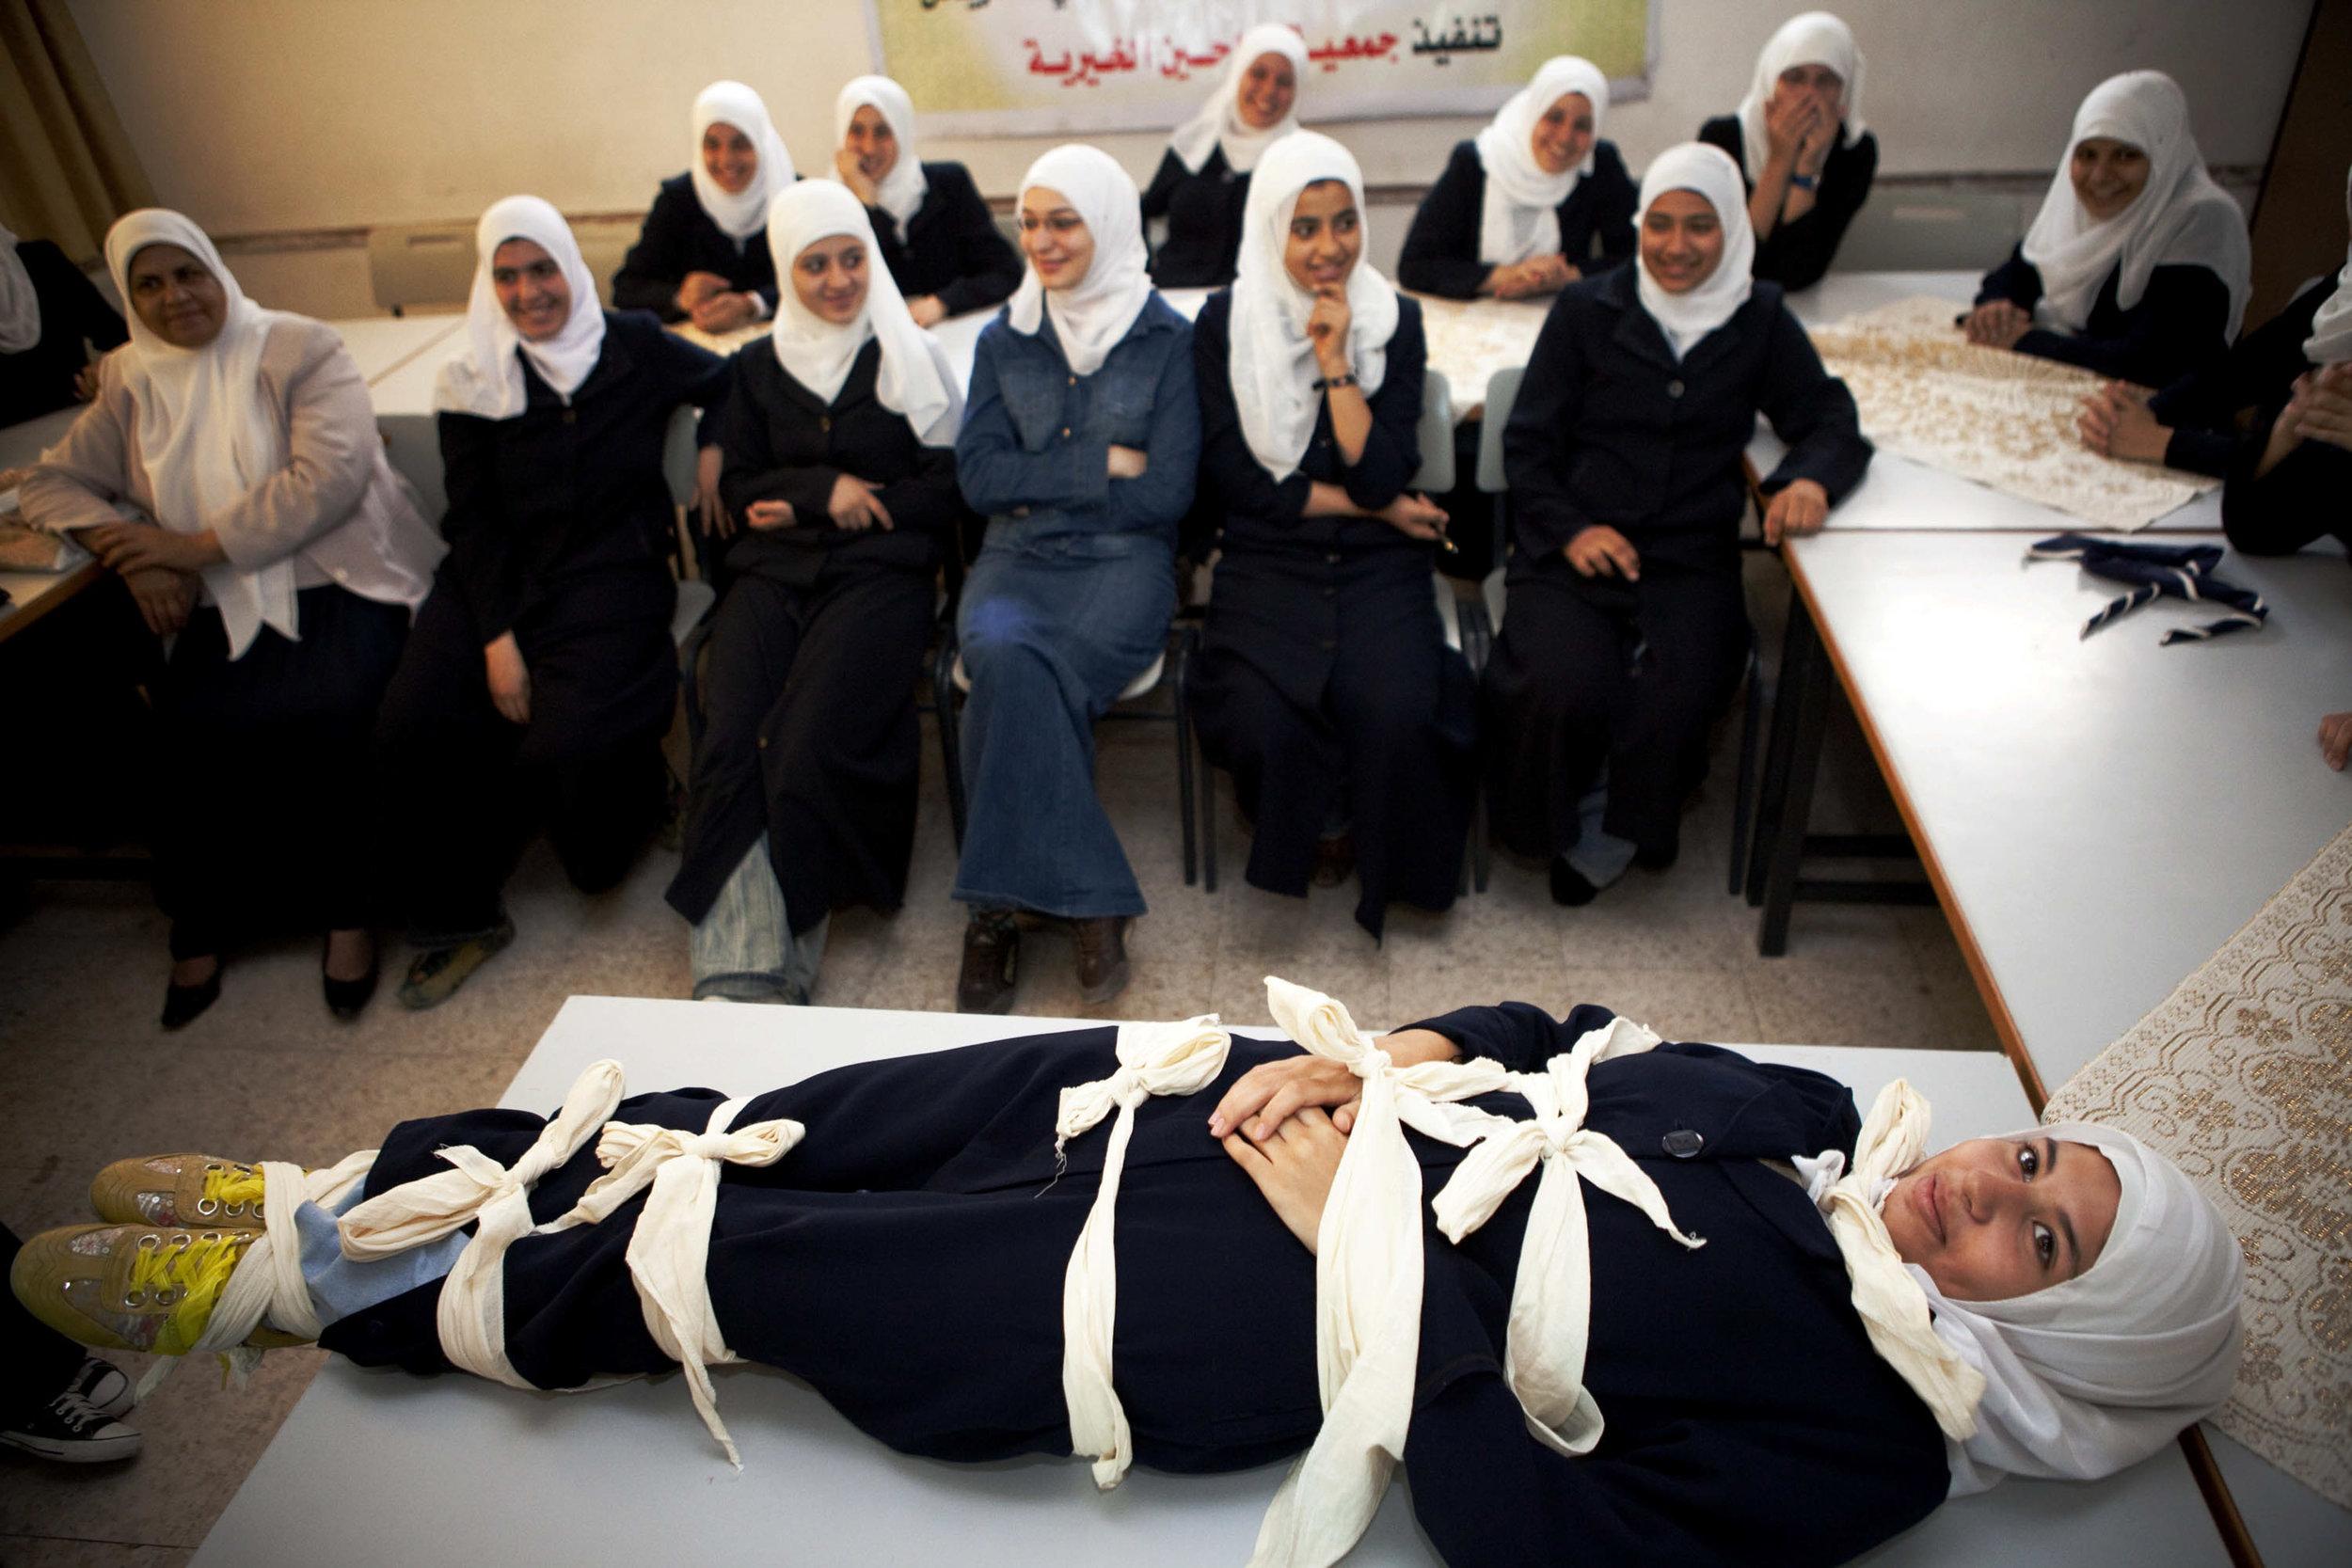 Occupied Palestinian Territories, Gaza, Gaza City, 25 October 2009A girl tied up in a classroom.Tanya Habjouqa / NOOR